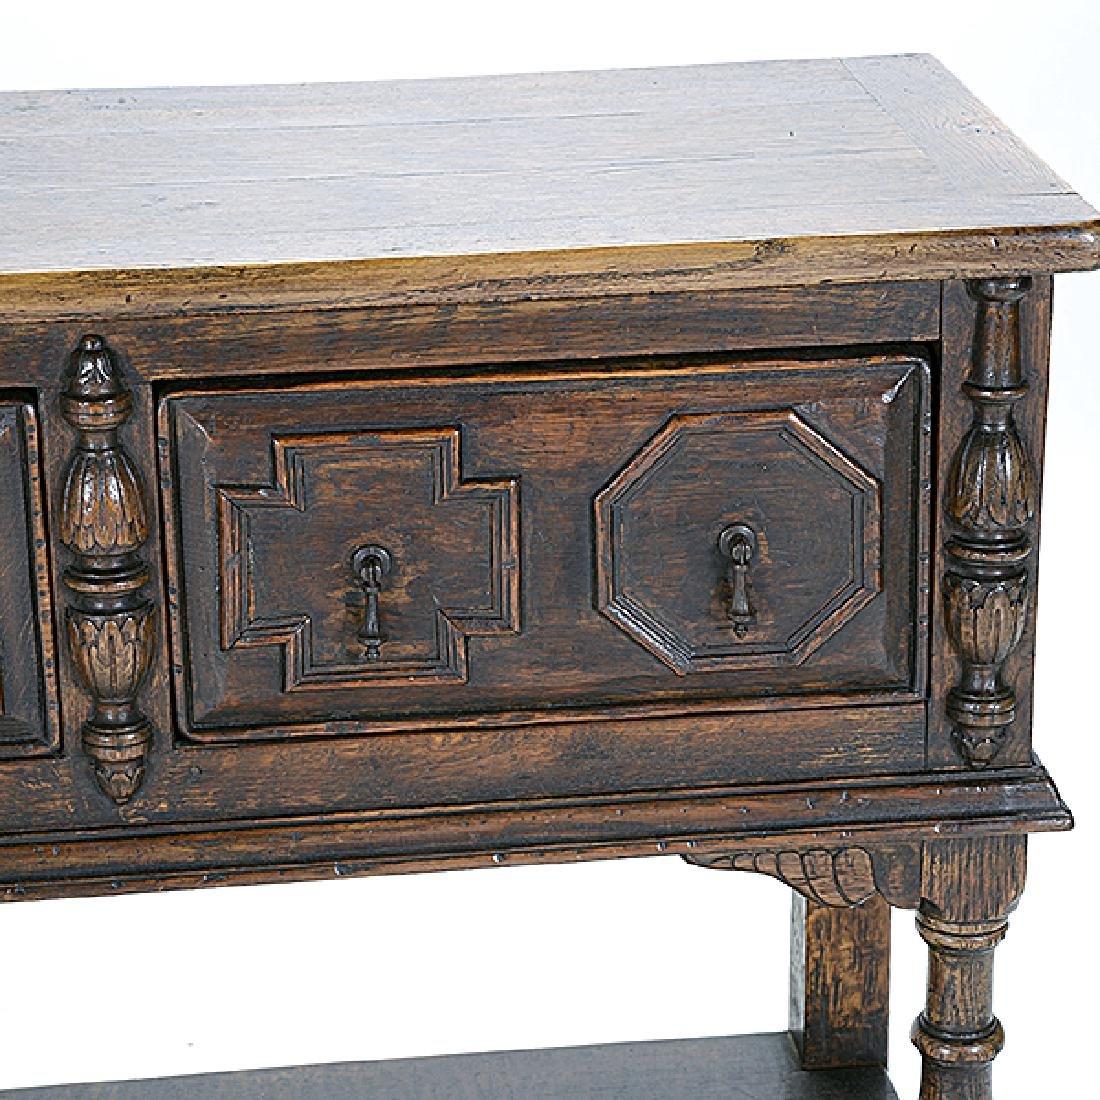 Dutch Baroque Style Sideboard - 5